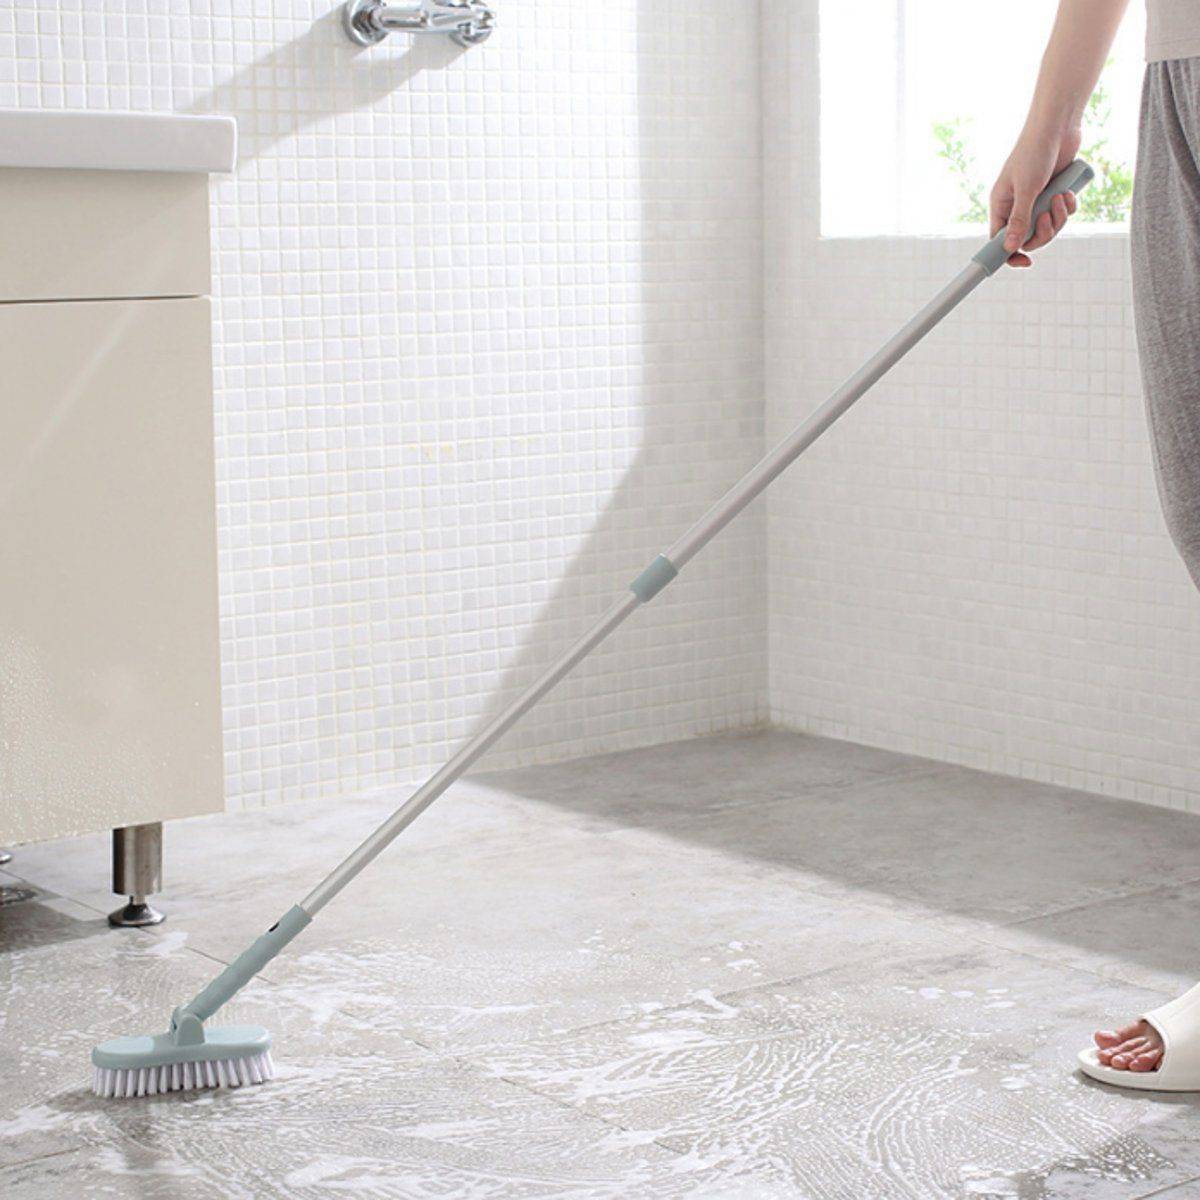 Retractable Bathroom Long Handle Brush Wall Floor Scrub Bathtub Shower Tile Cleaning Brushes Tool Cleaning Shower Tiles Shower Tile Clean Tile